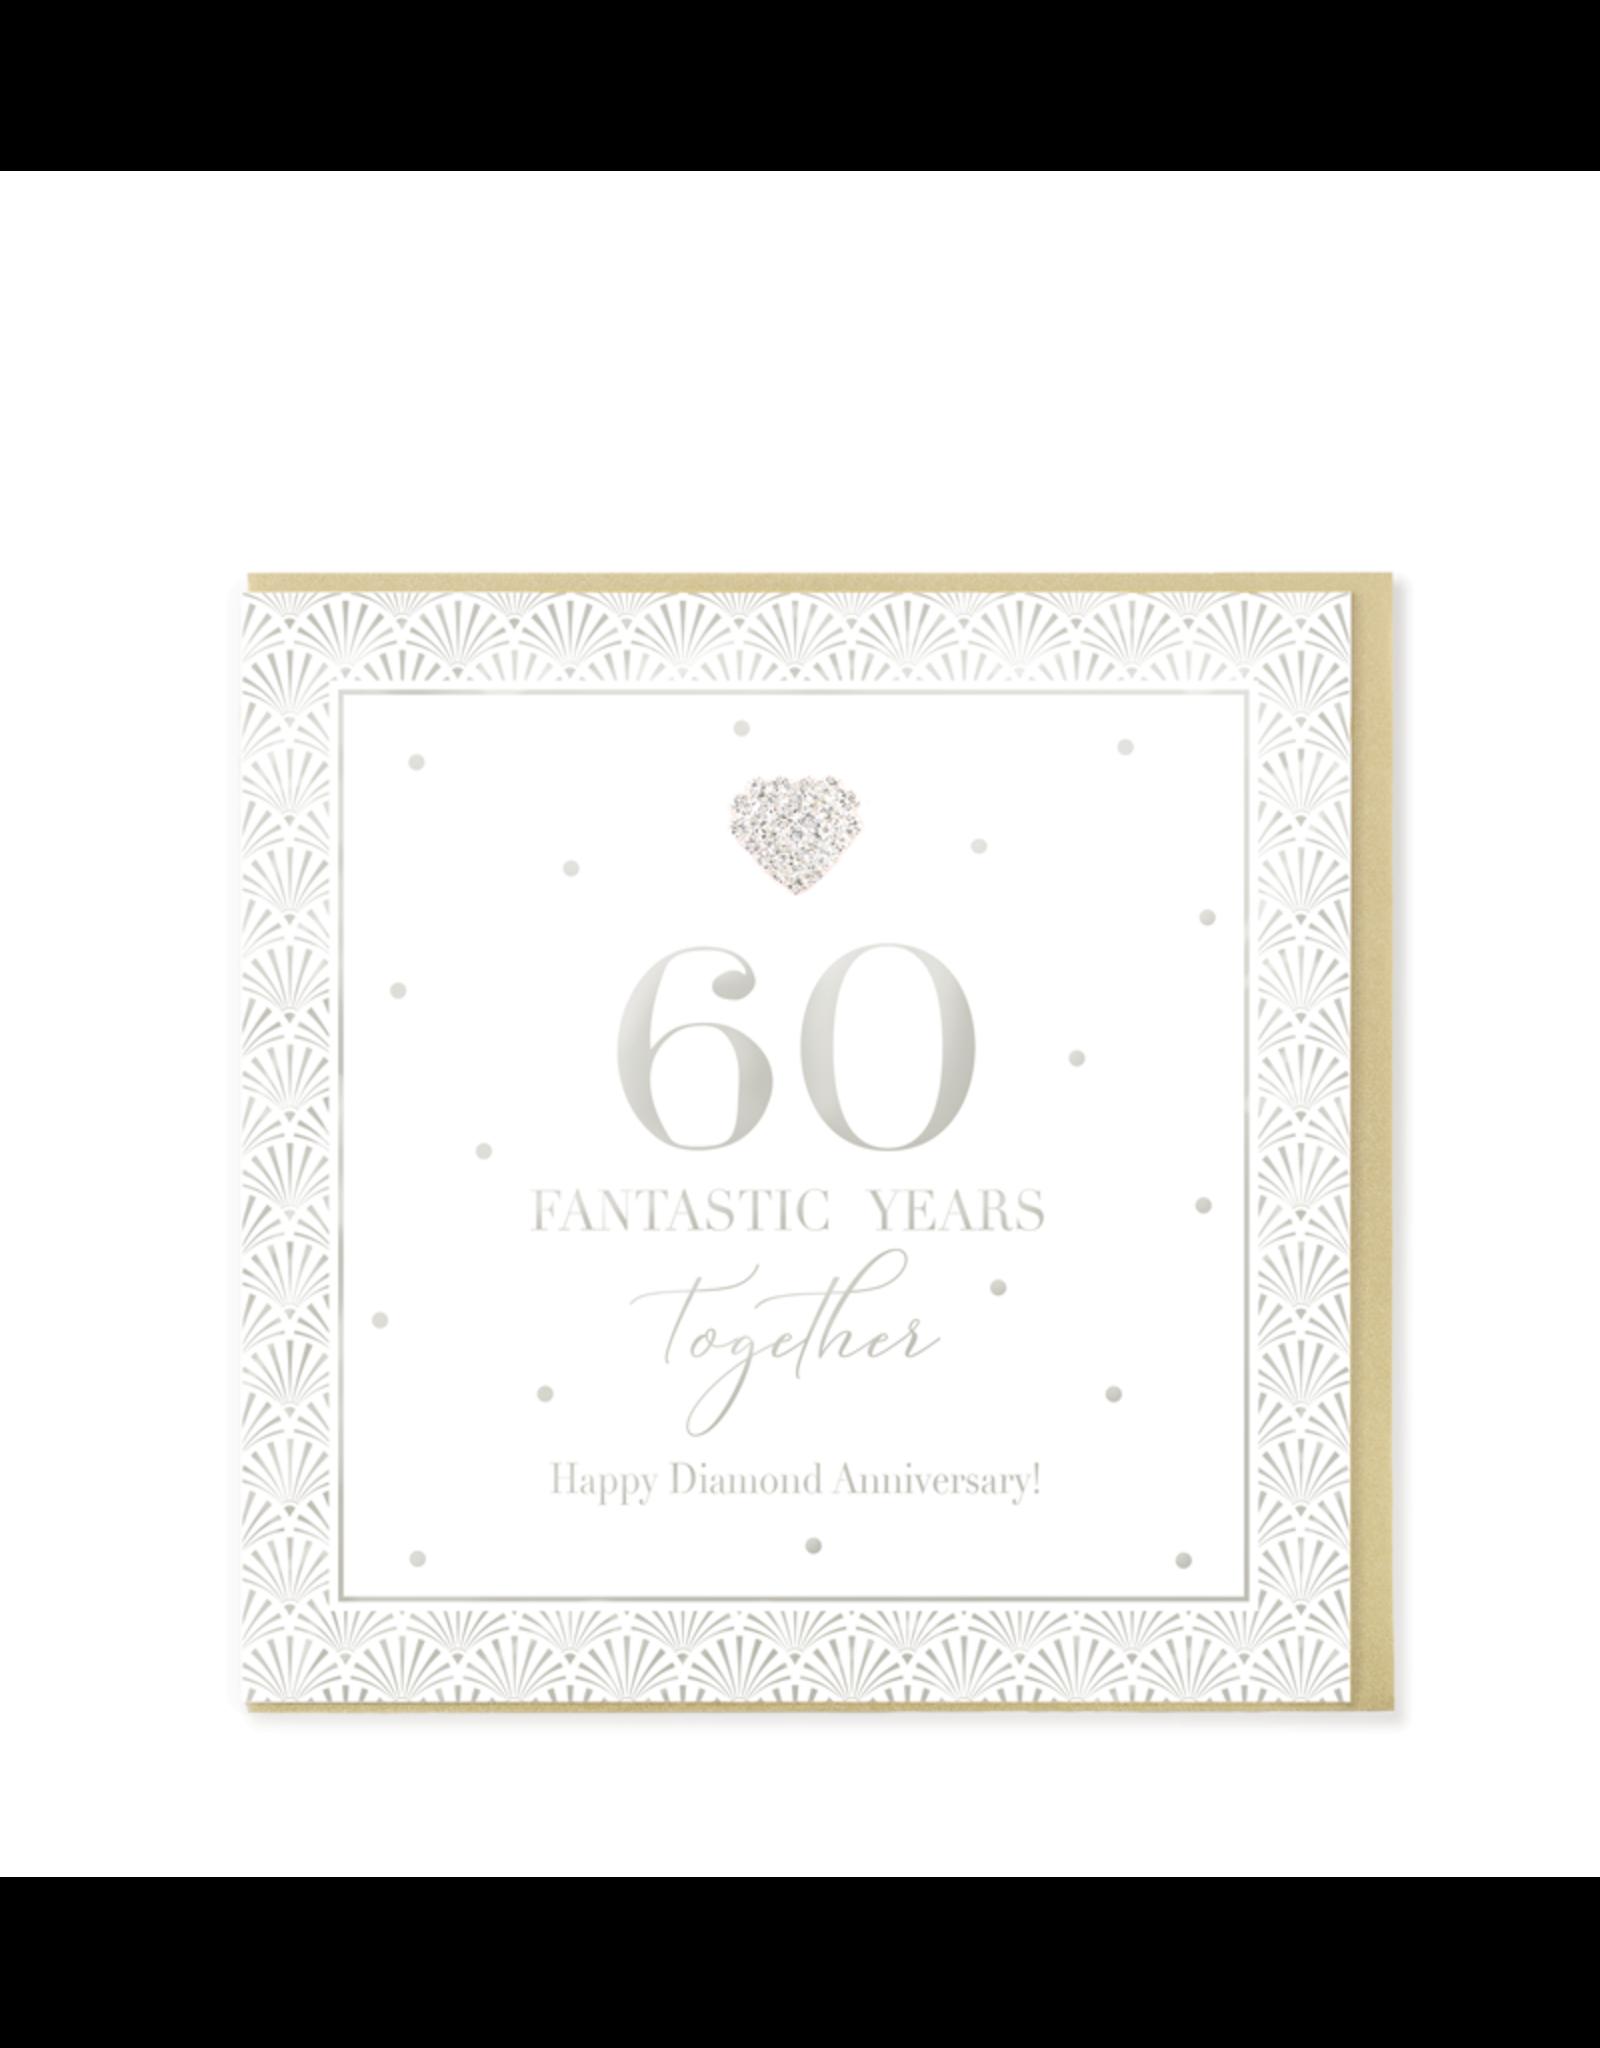 Hearts Design Wenskaart - 60 Fantastic Years Together